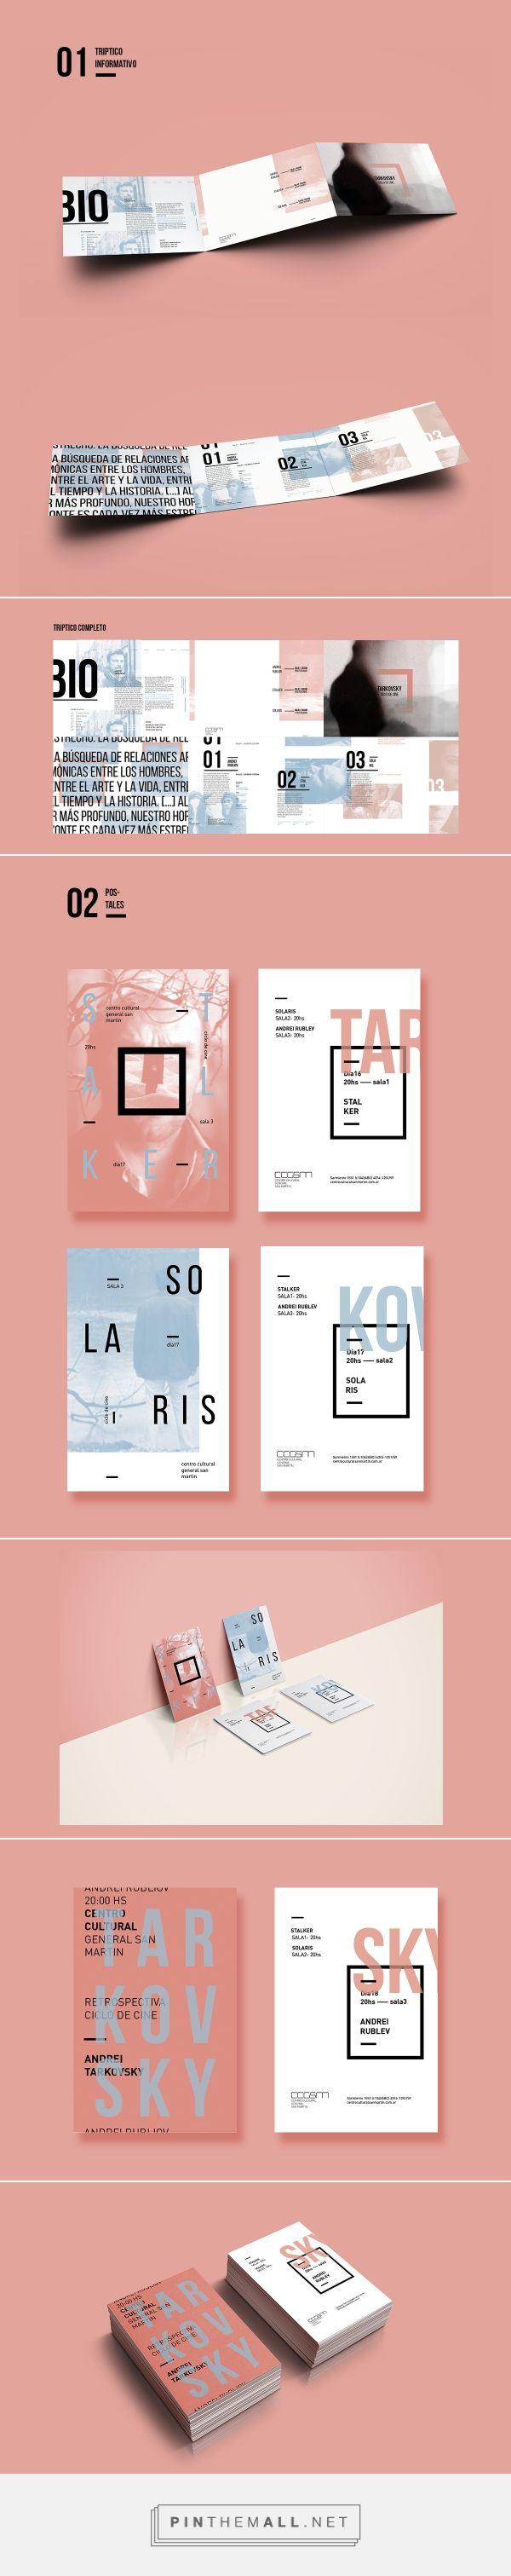 Fivestar Branding Agency Business Branding And Web Design For Small Business Owners Grafik Design Leaflet Design Magazine Design